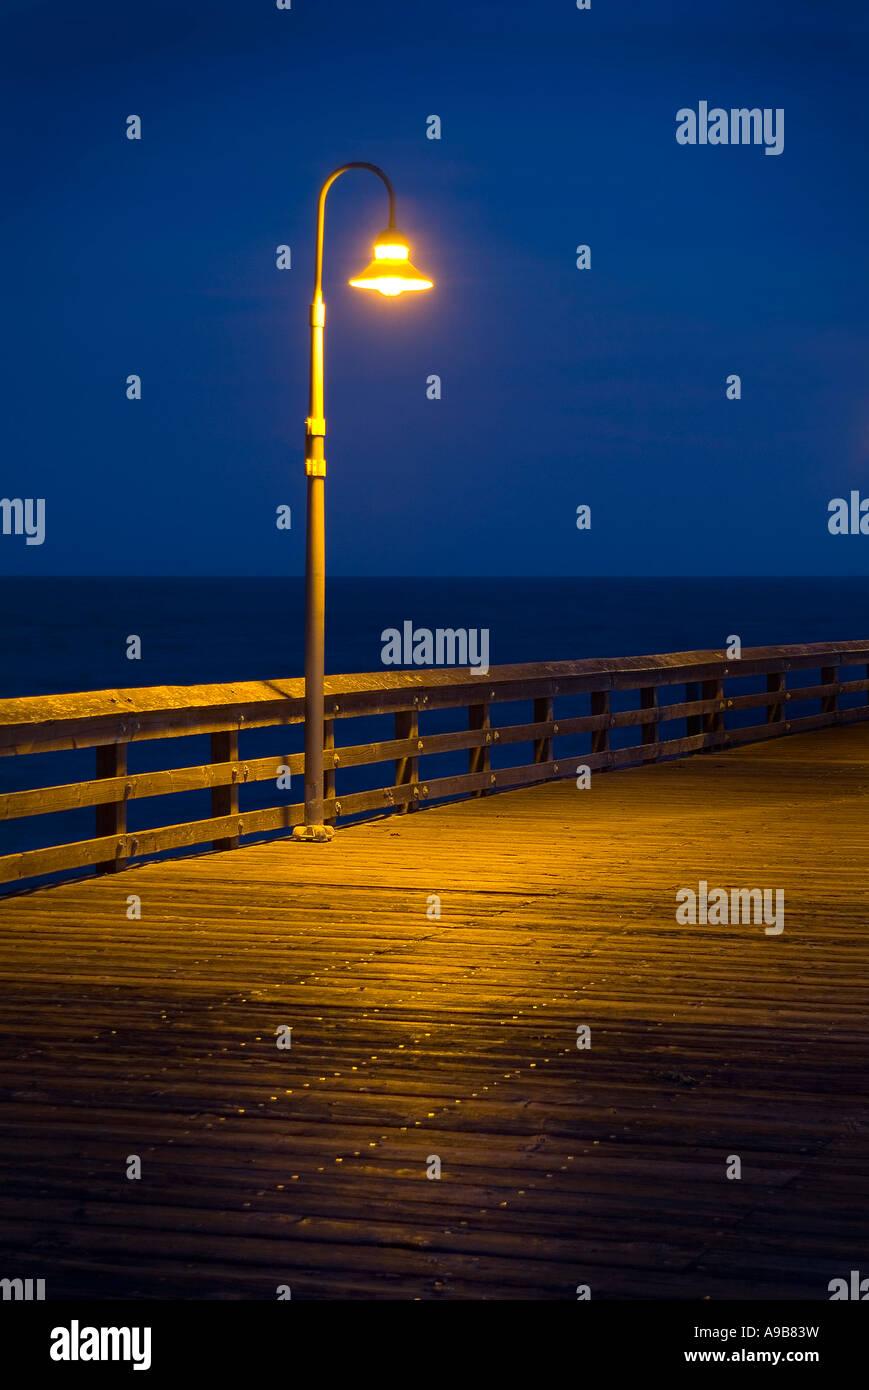 lampadaire solitaire bord de marche avec la lumi re allum la nuit pr s de l 39 oc an jet e de. Black Bedroom Furniture Sets. Home Design Ideas